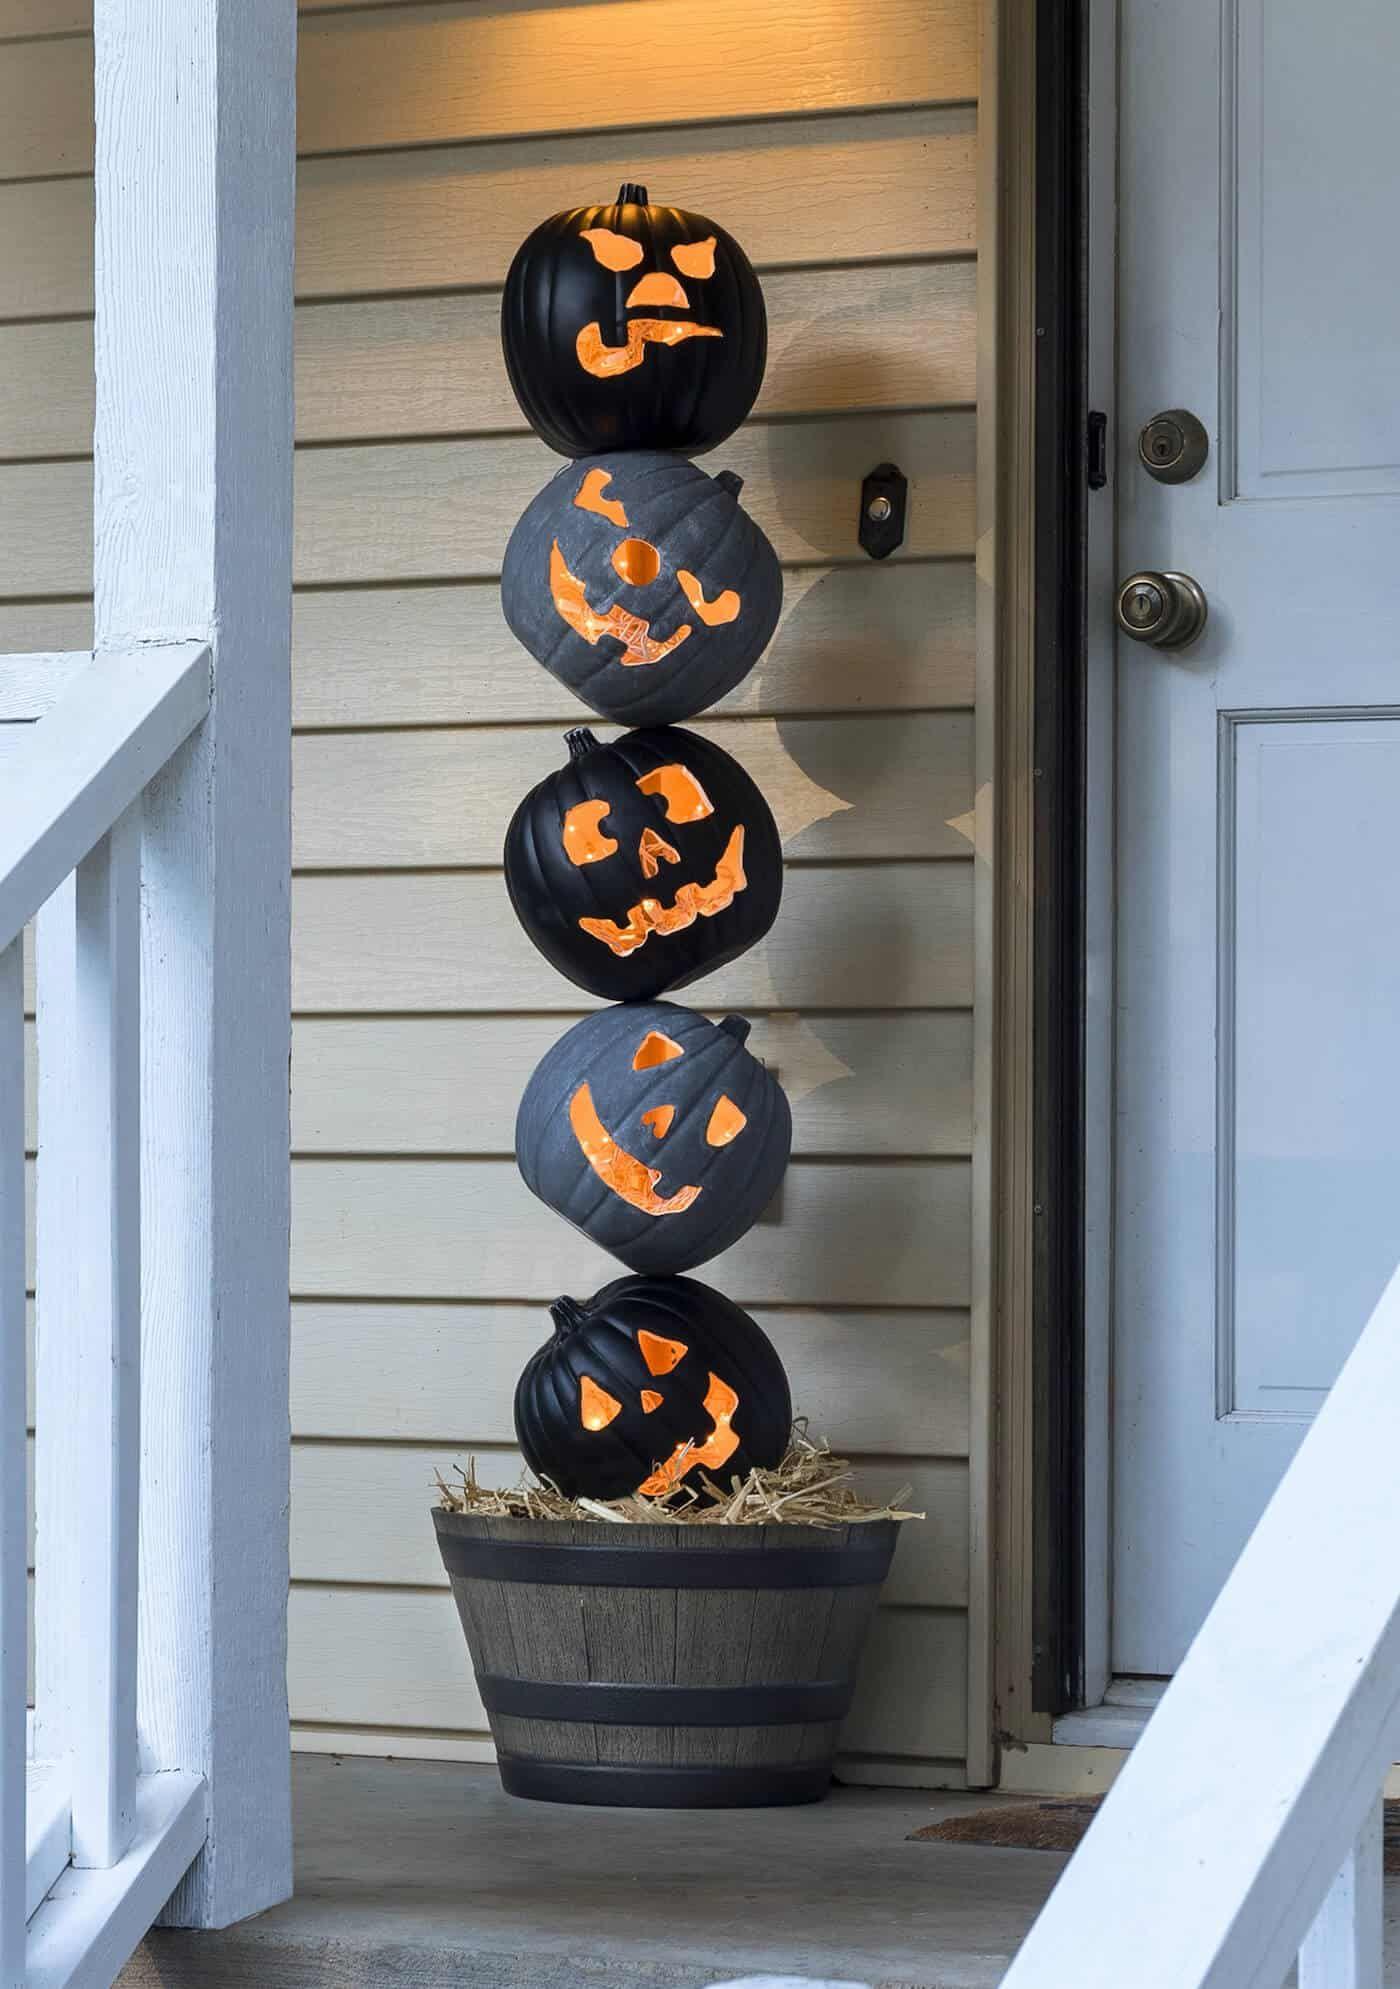 47 Outdoor Halloween Decorations Porch Decorating Ideas